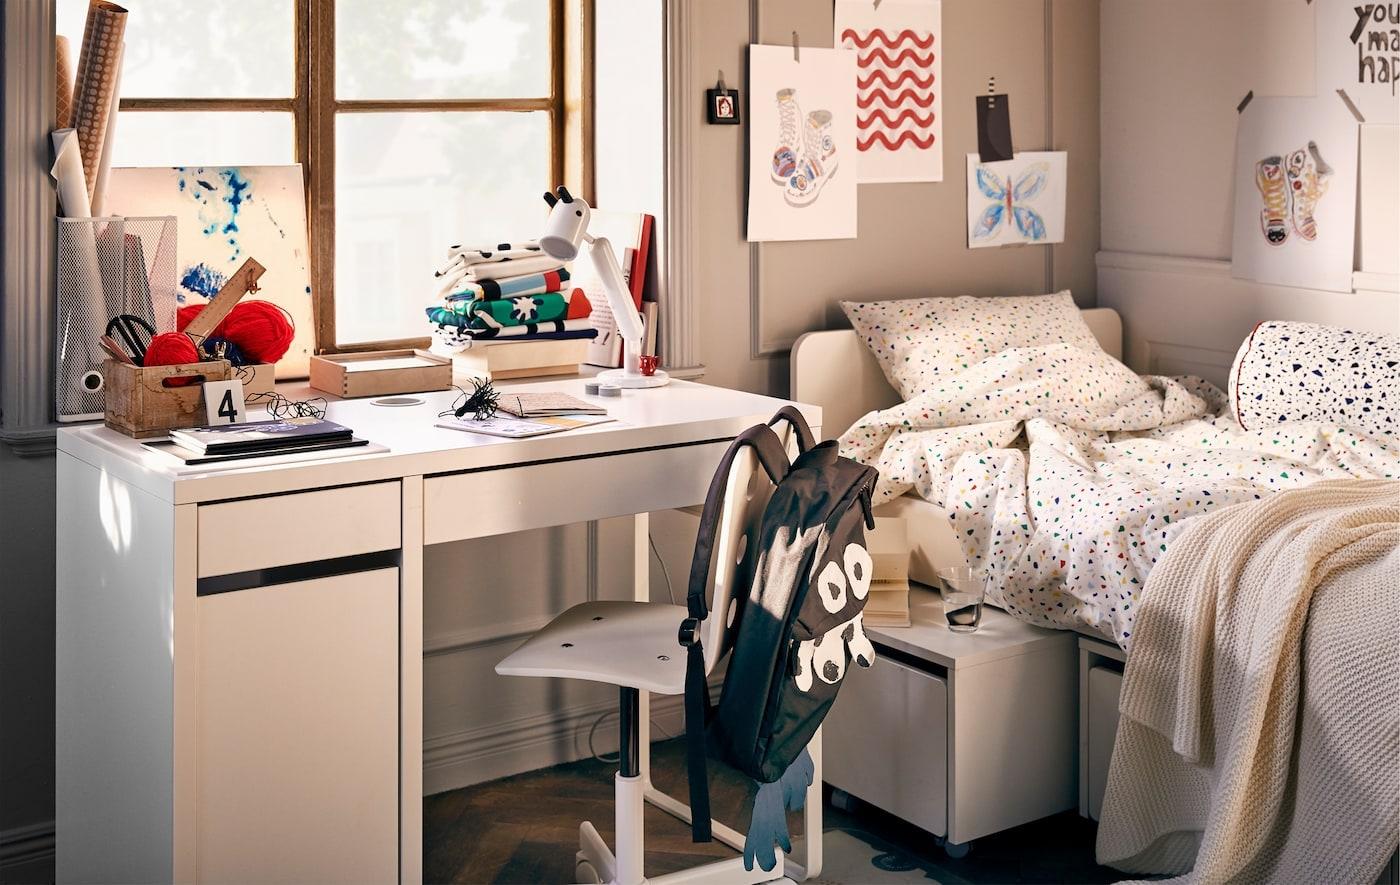 Customisez les fournitures scolaires - IKEA